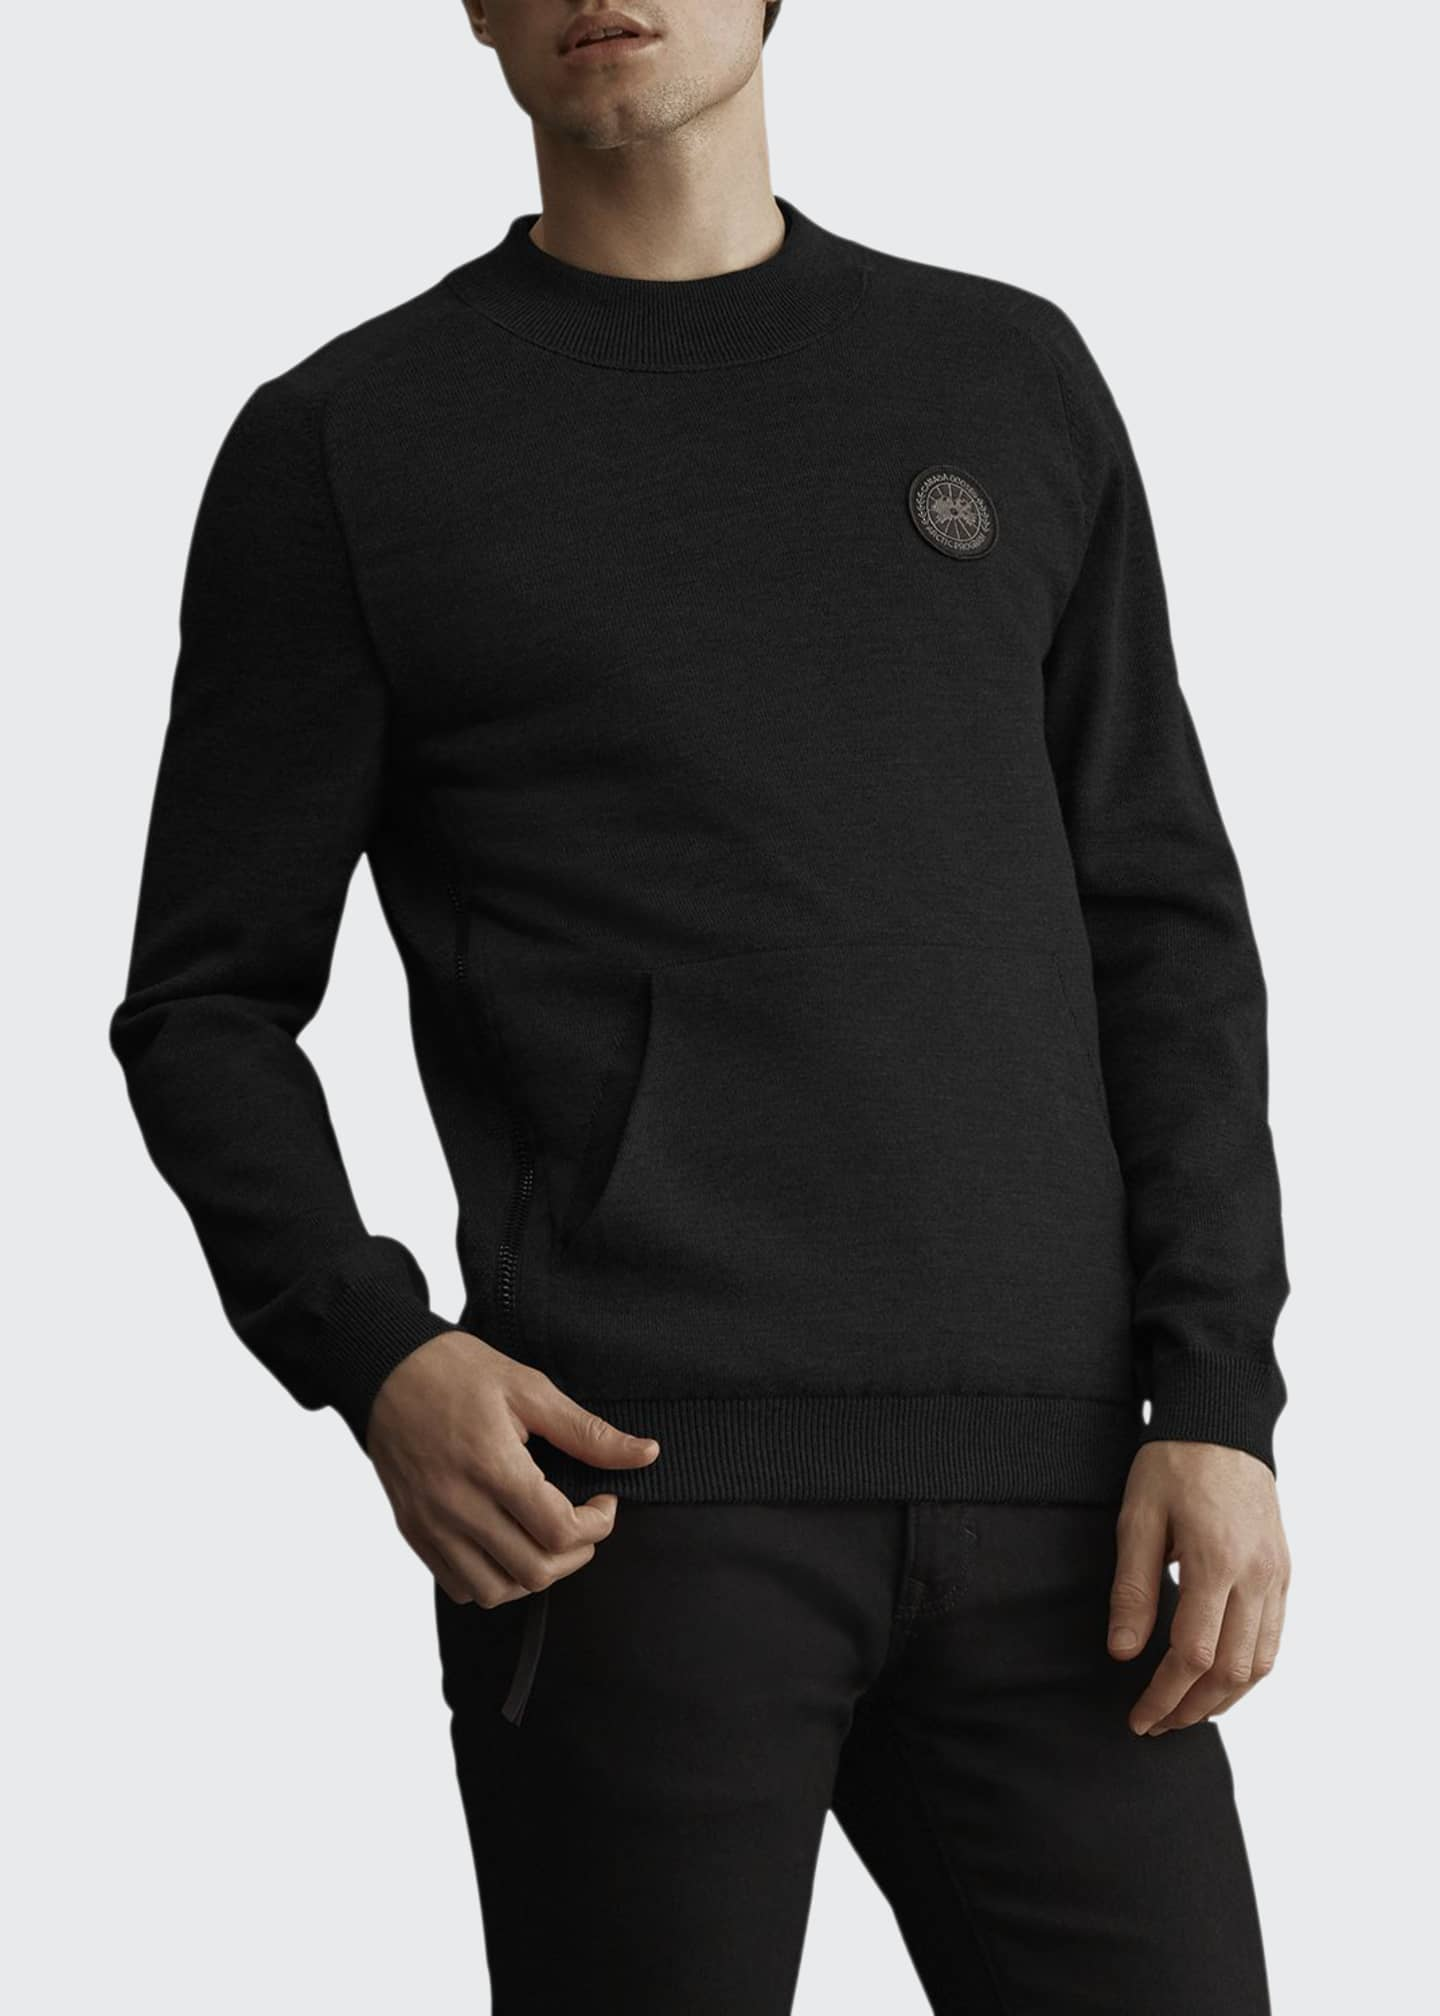 Canada Goose Men's Hybridge Reversible Sweatshirt